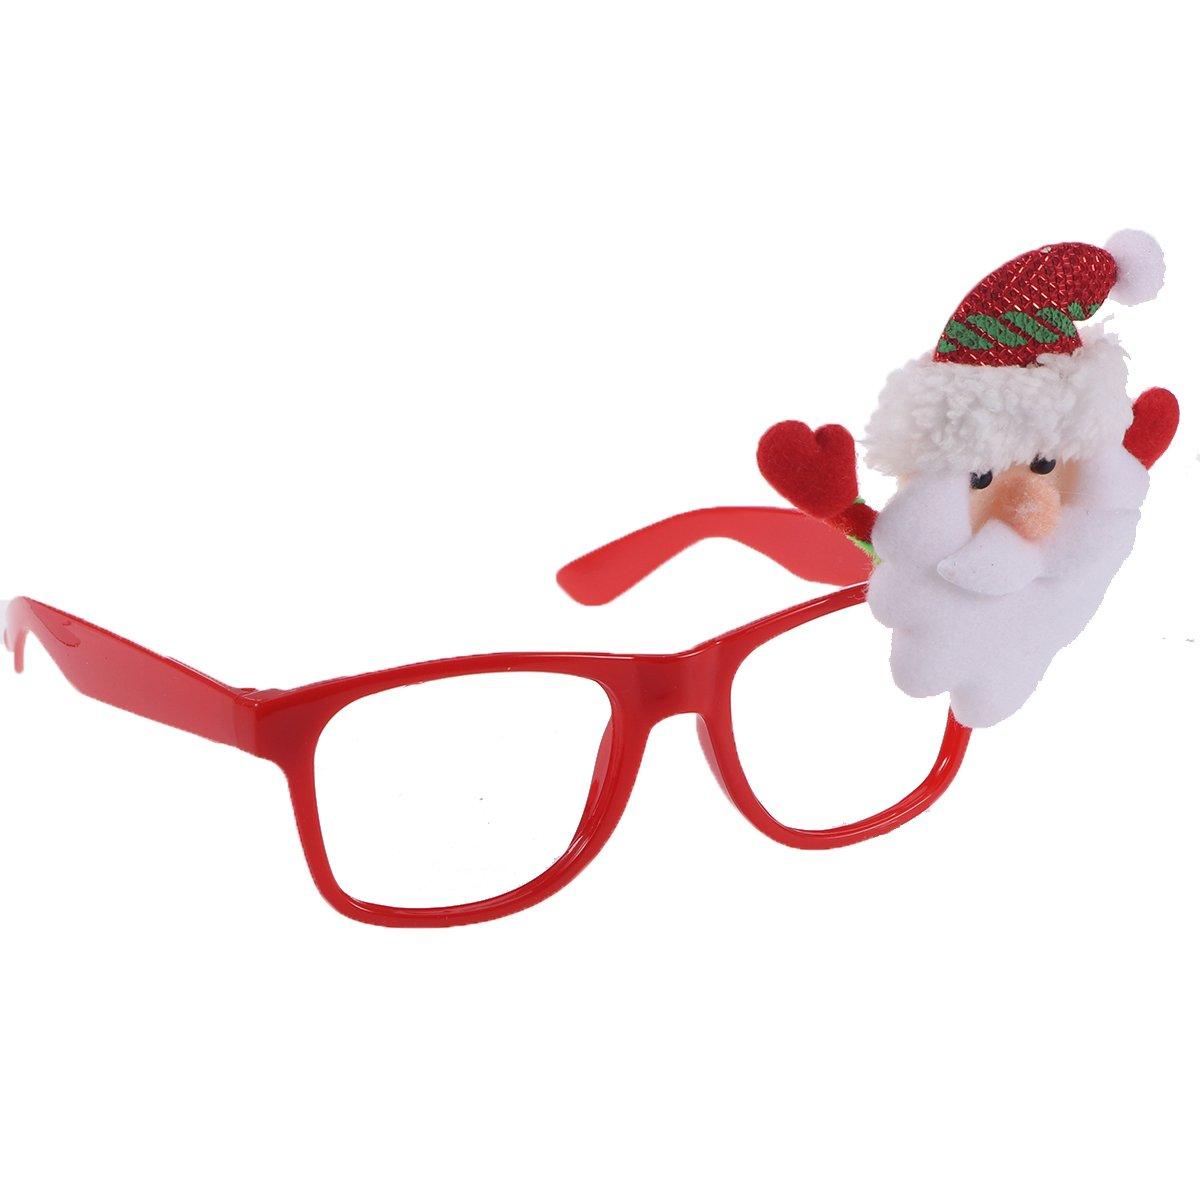 Christmas Fancy Dress Funny.Amazon Com Tinksky Novelty Christmas Fancy Dress Funny